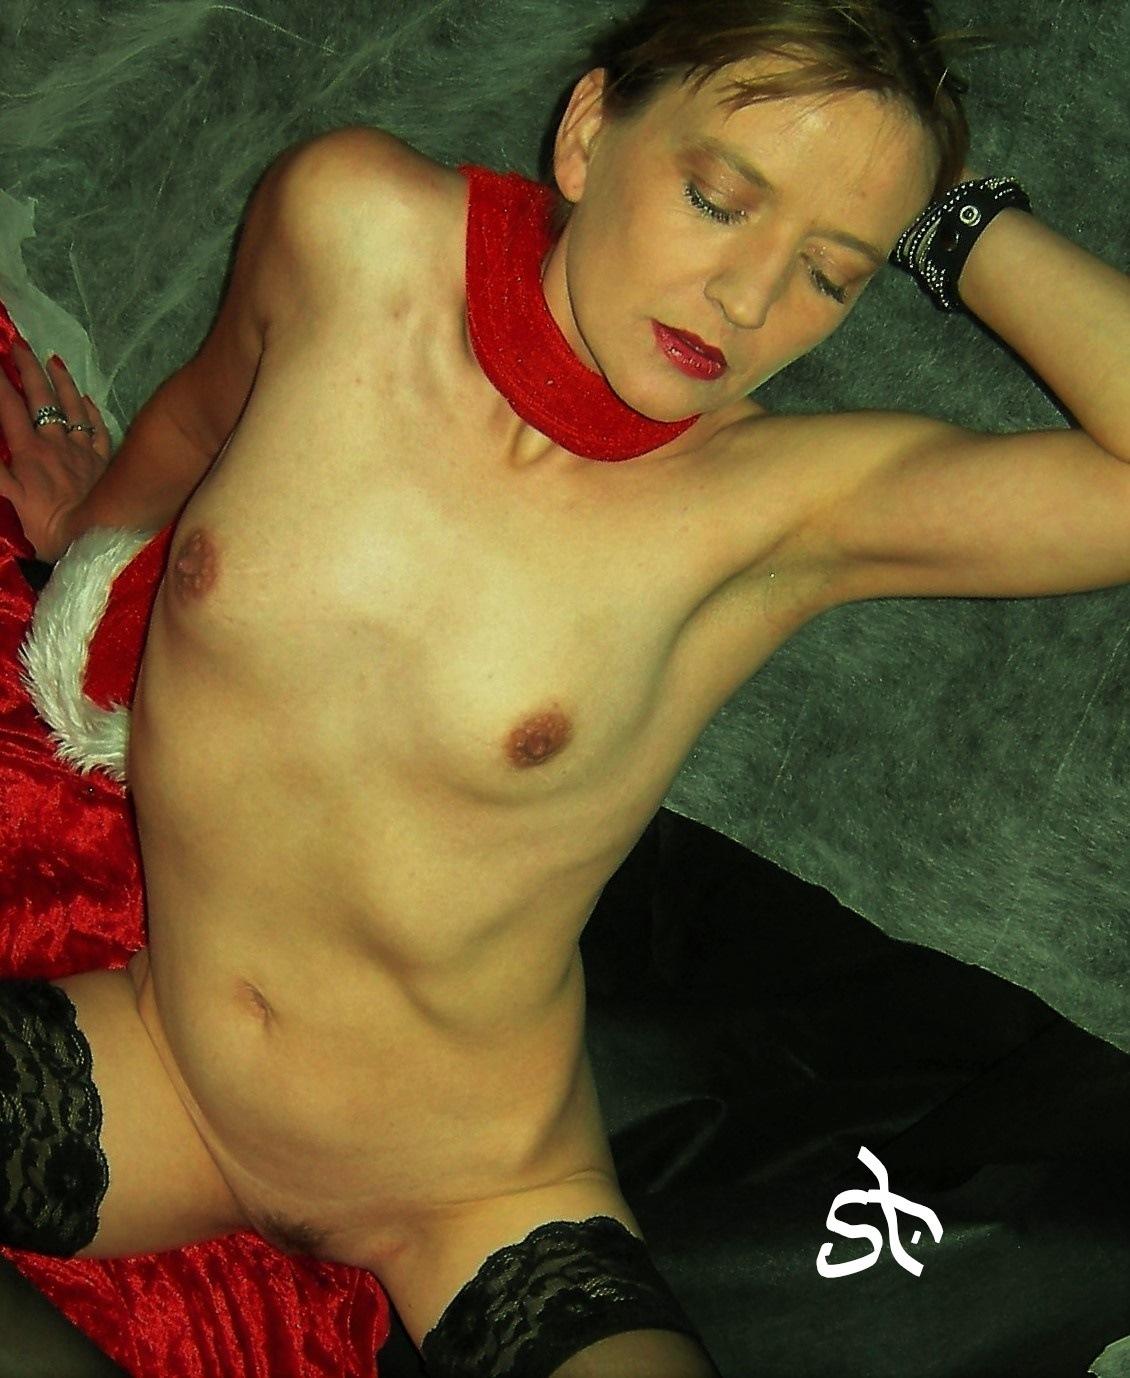 Santas helper posing nude. by Joergen Hansen